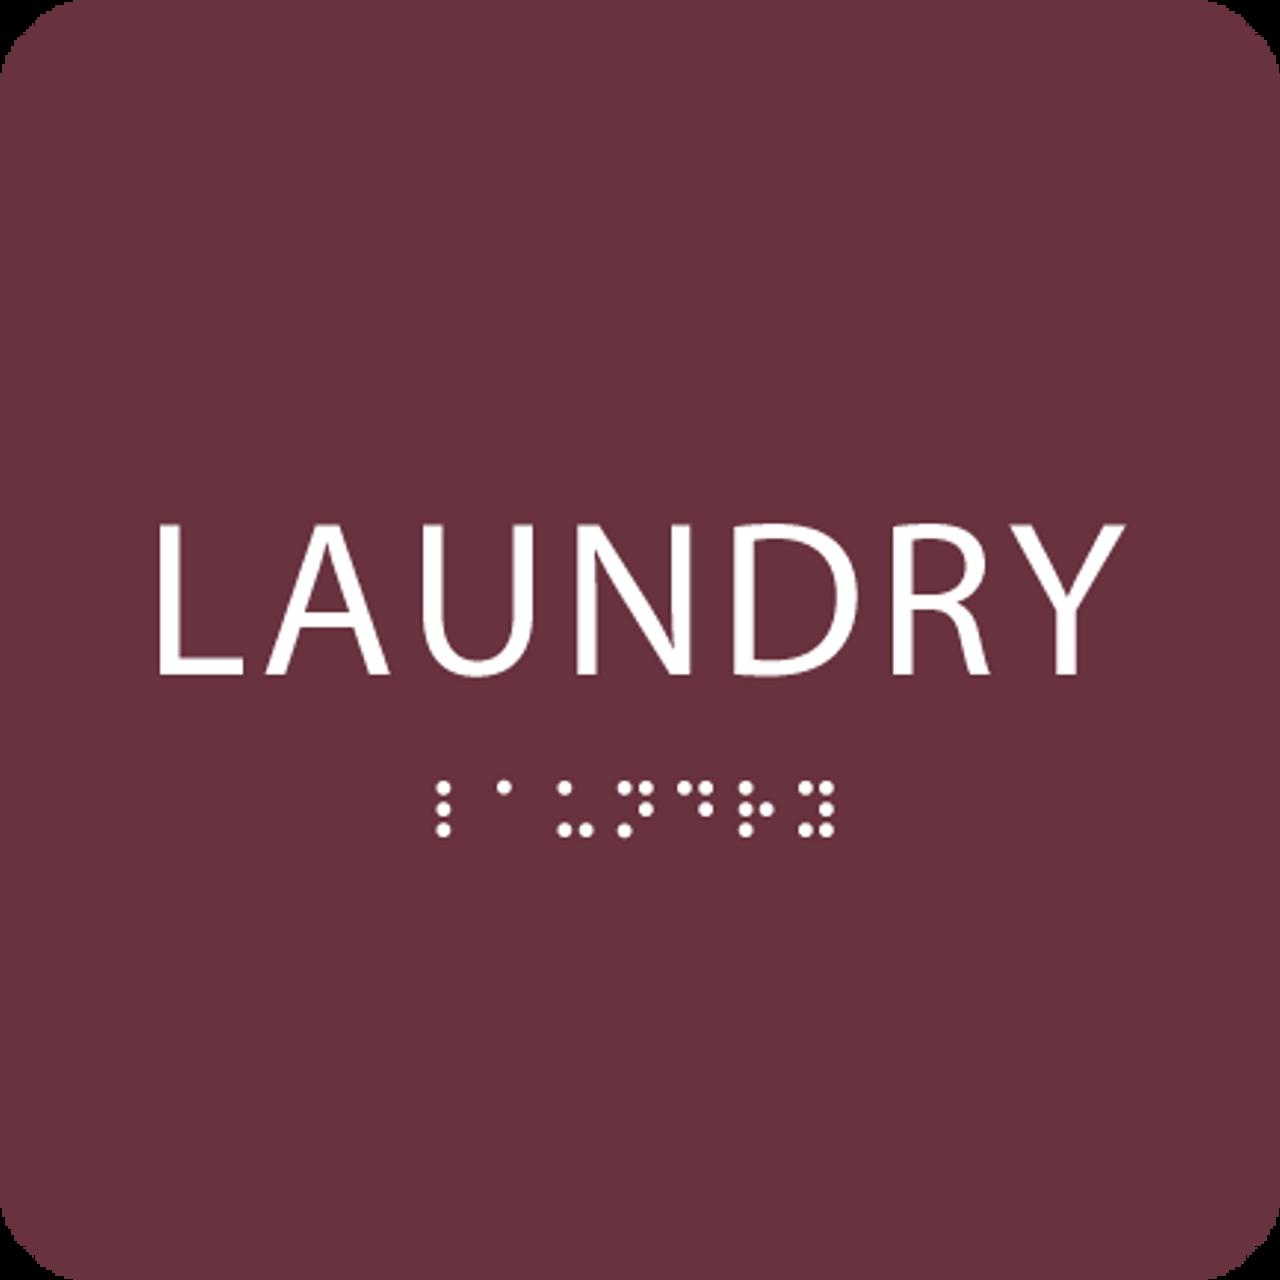 Burgundy Laundry ADA Sign